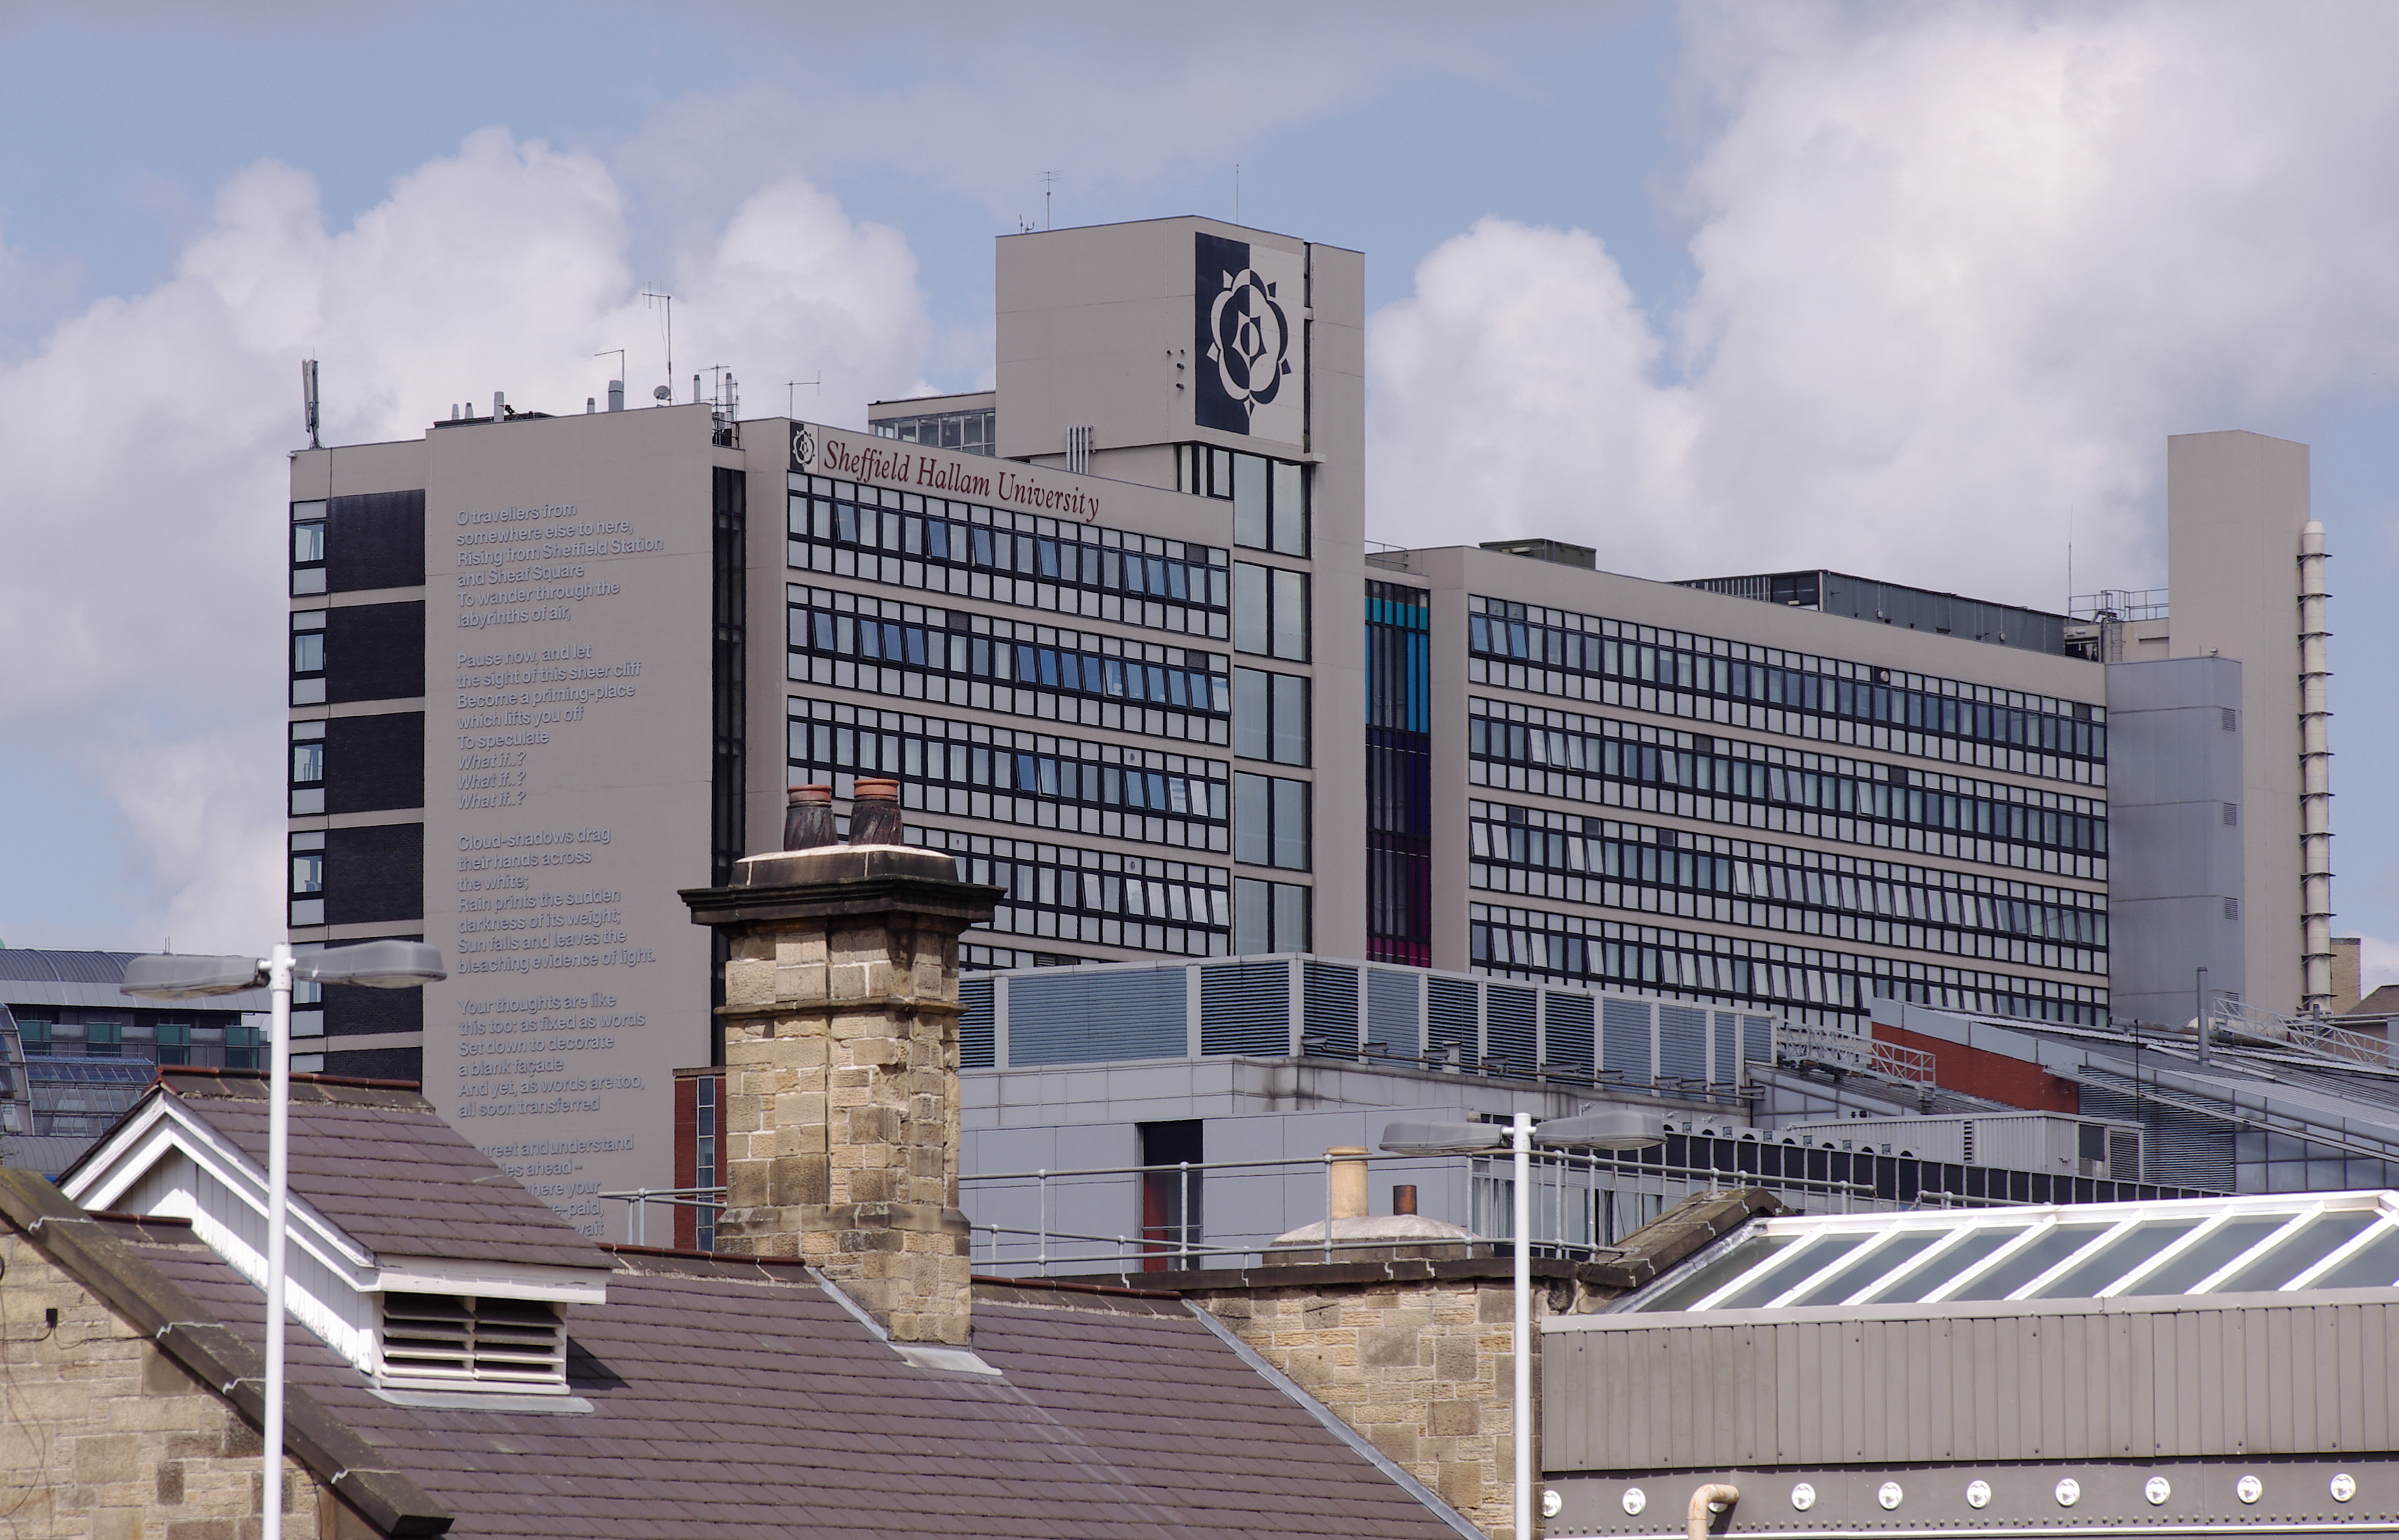 Sheffield Hallam University Room Hire Discount